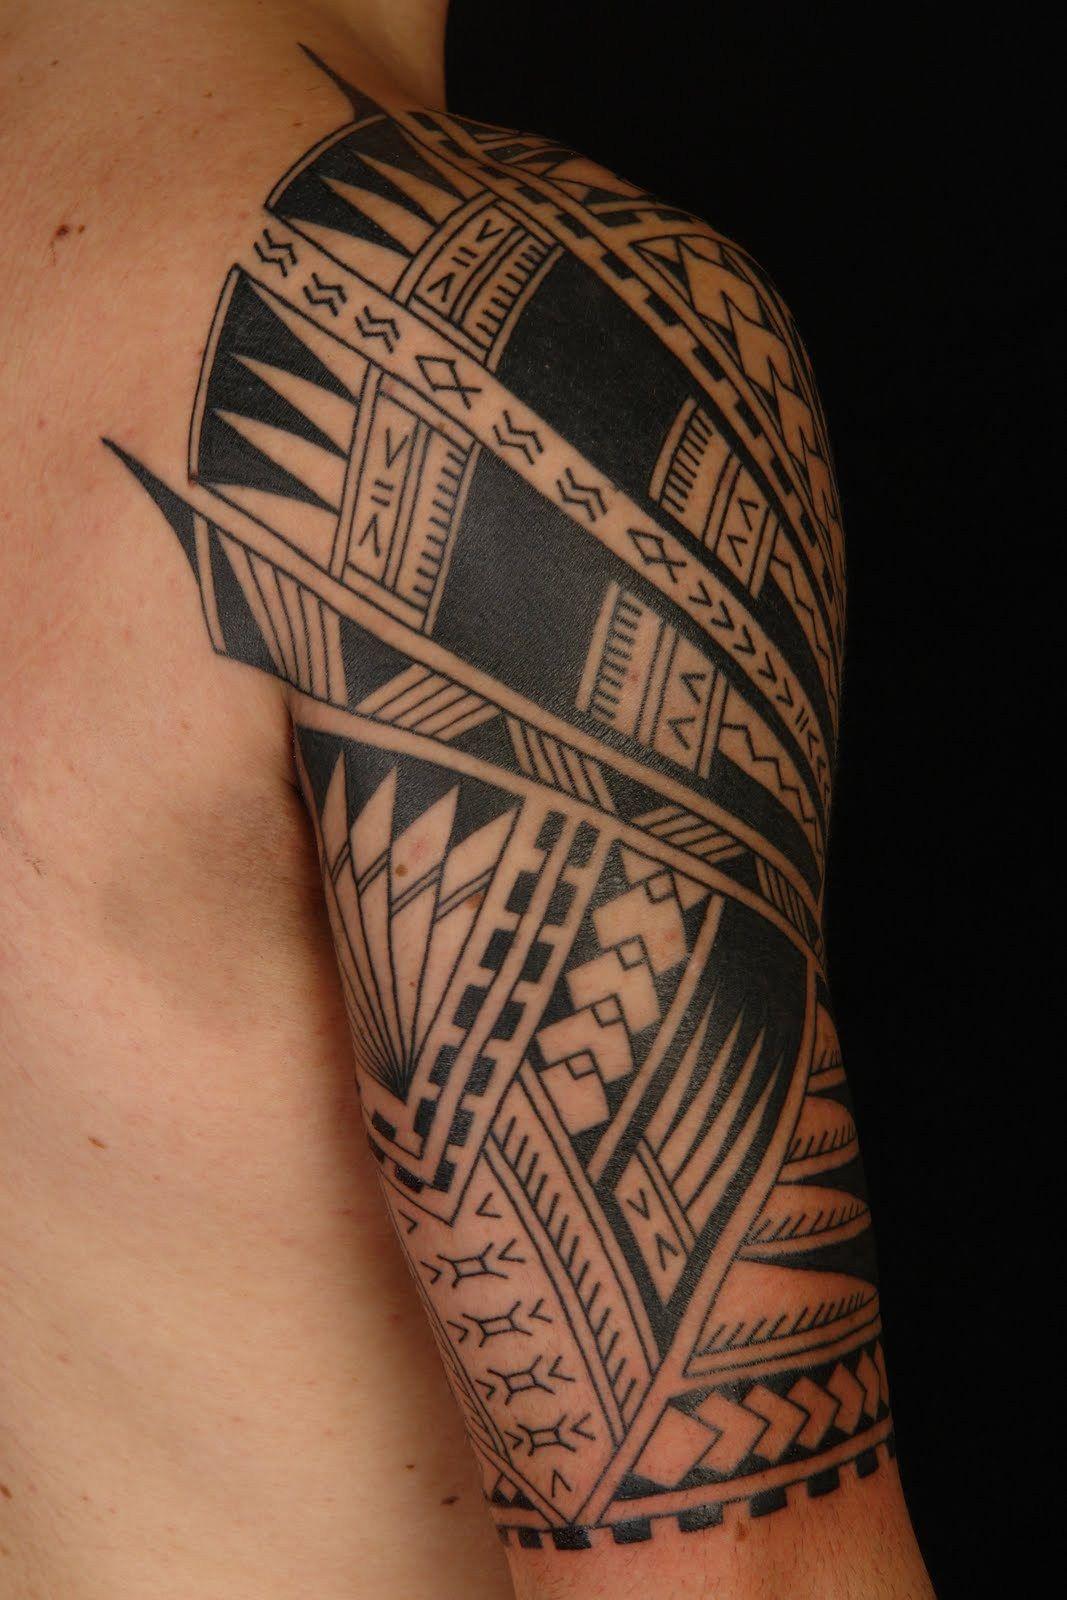 Significado da Tatuagem Maori Tattoo maori Maori and Tattoo